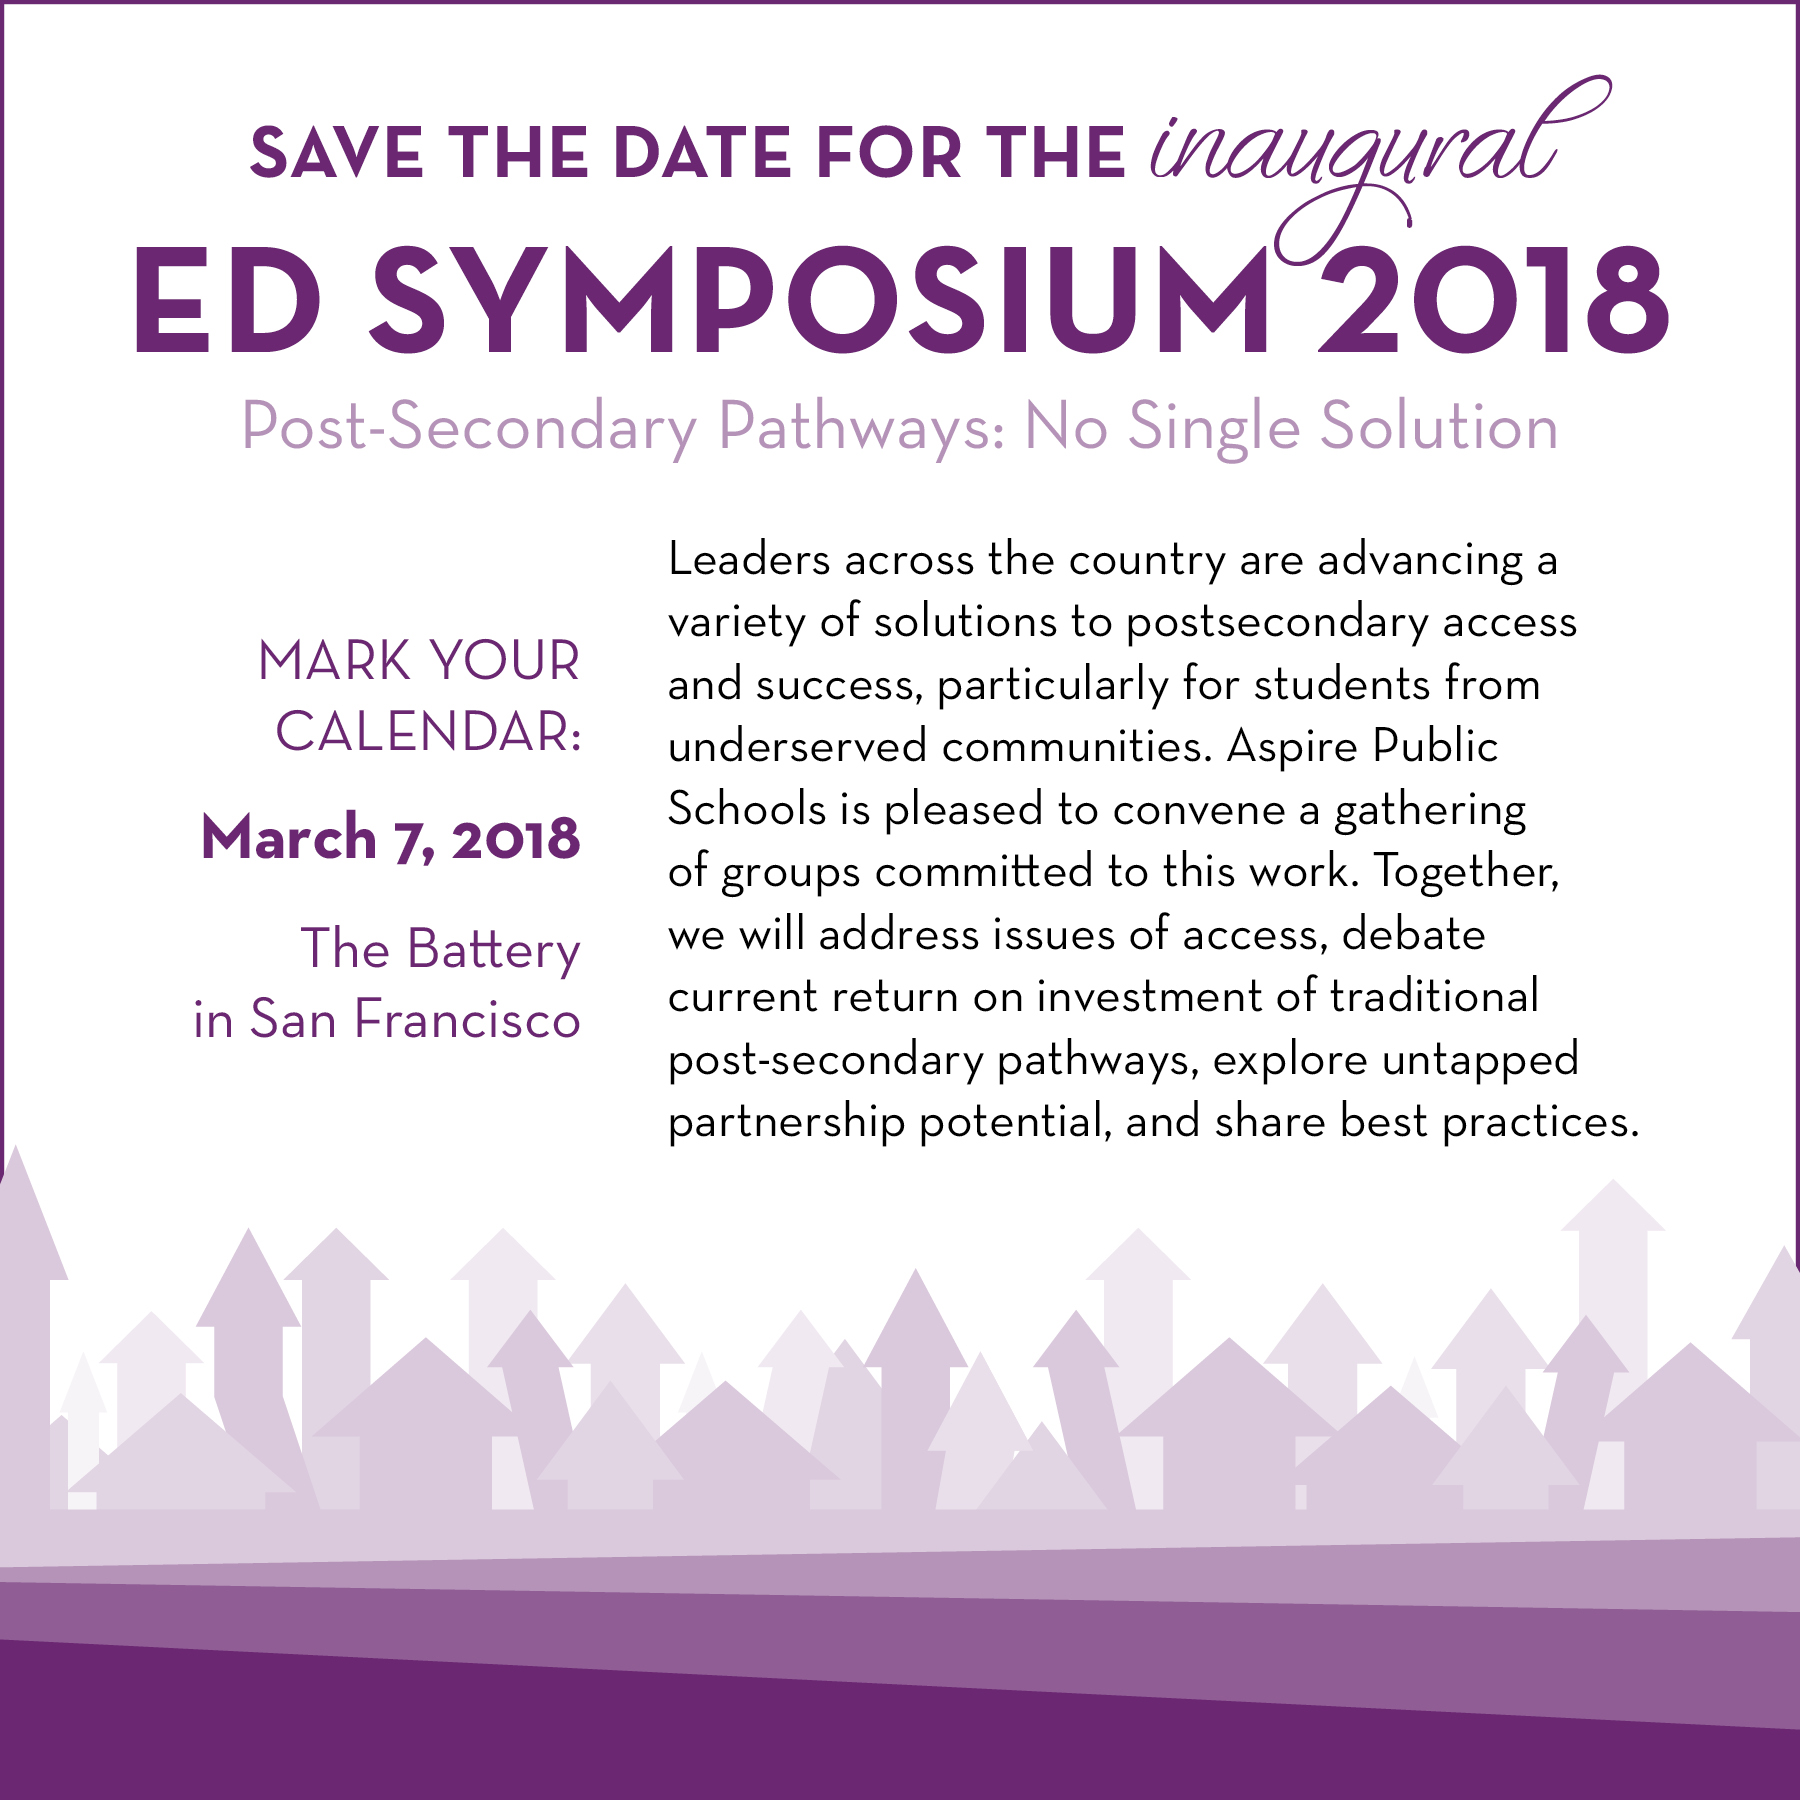 APS Ed Symposium Save the Date1.jpg